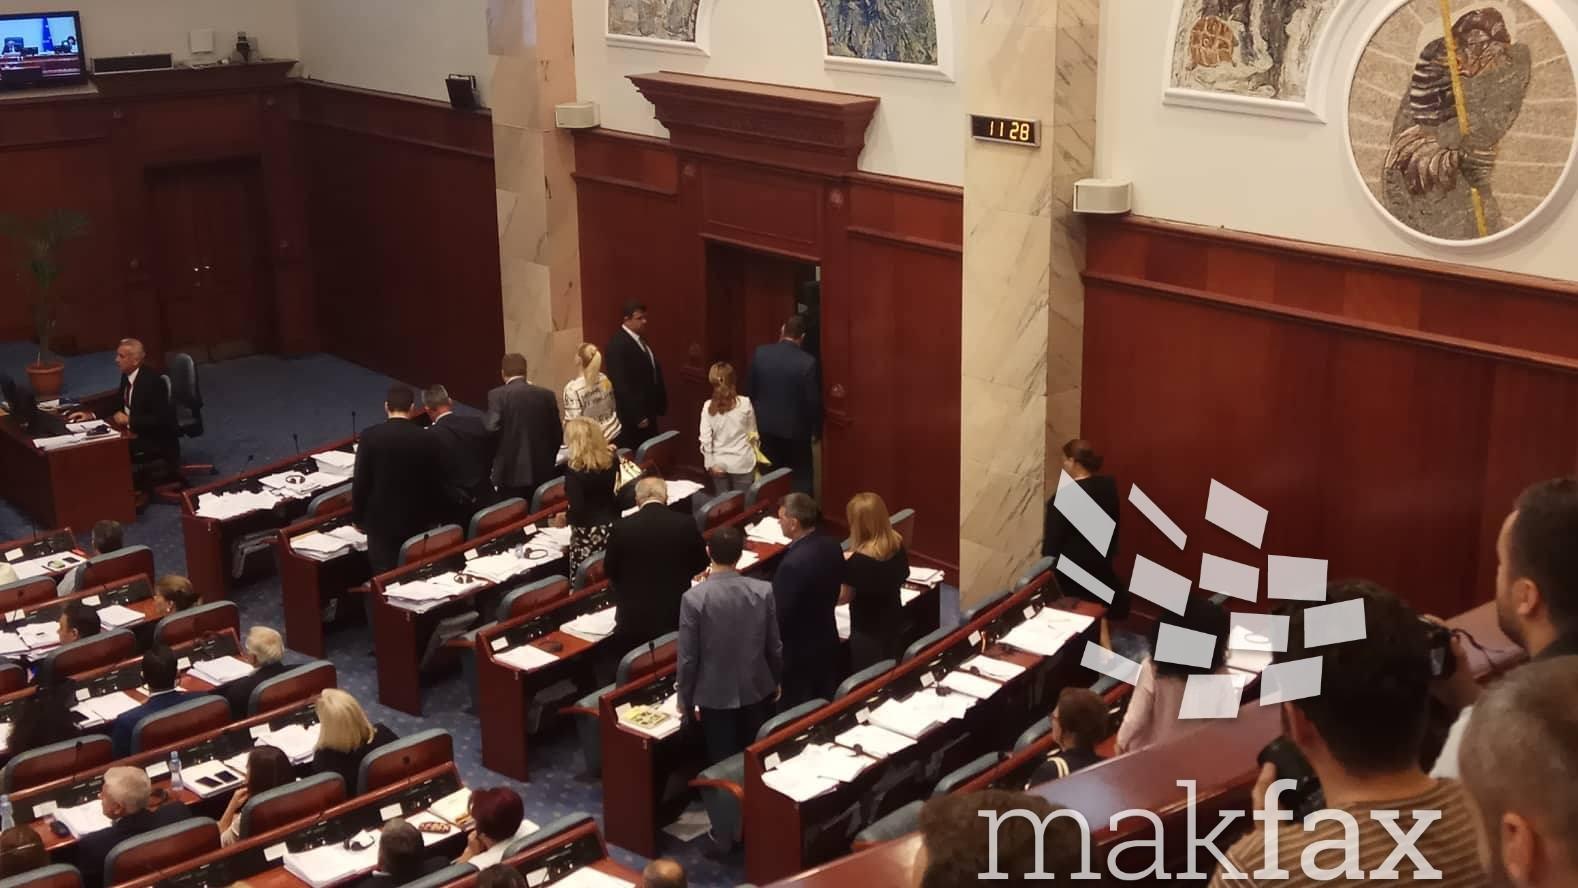 Oι βουλευτές του VMRO-DPMNE αποχωρούν από την αίθουσα